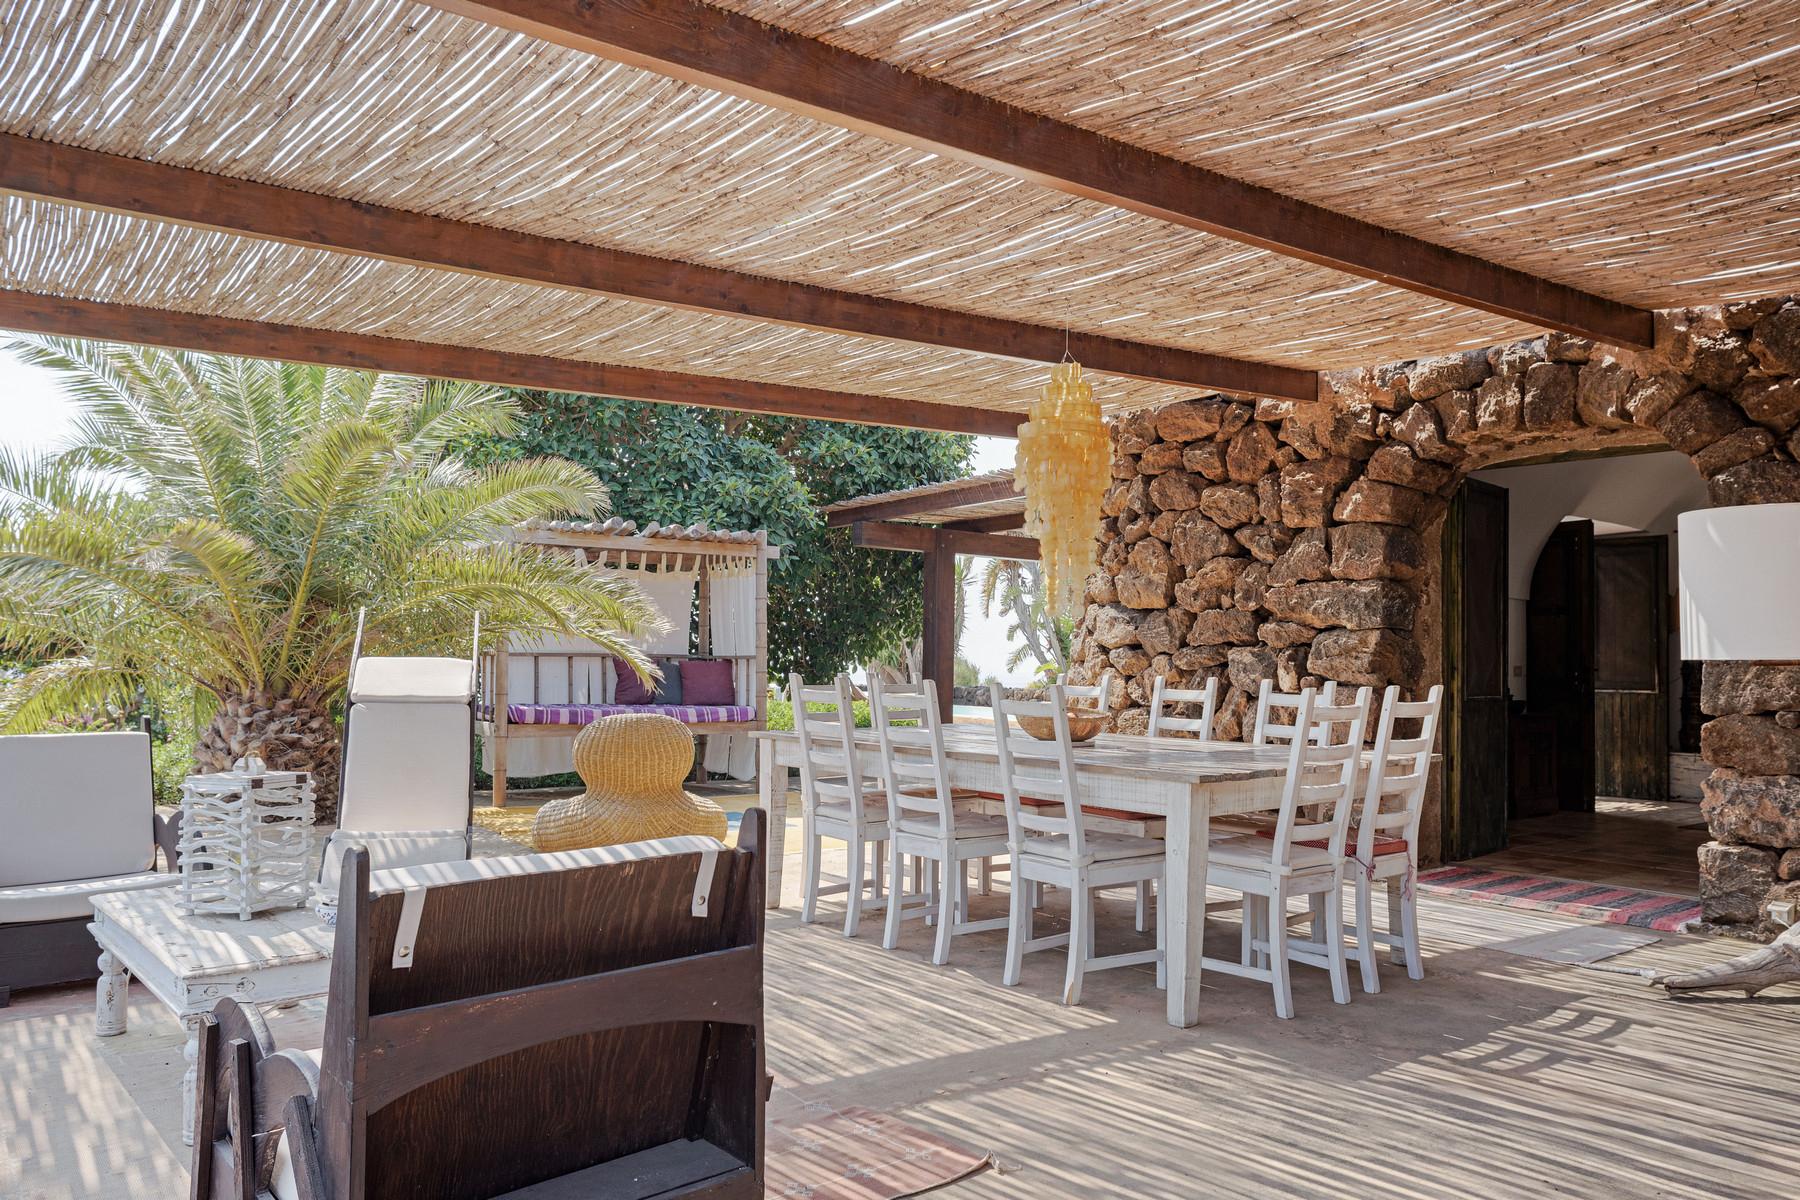 Villa in Vendita a Pantelleria: 5 locali, 82 mq - Foto 4